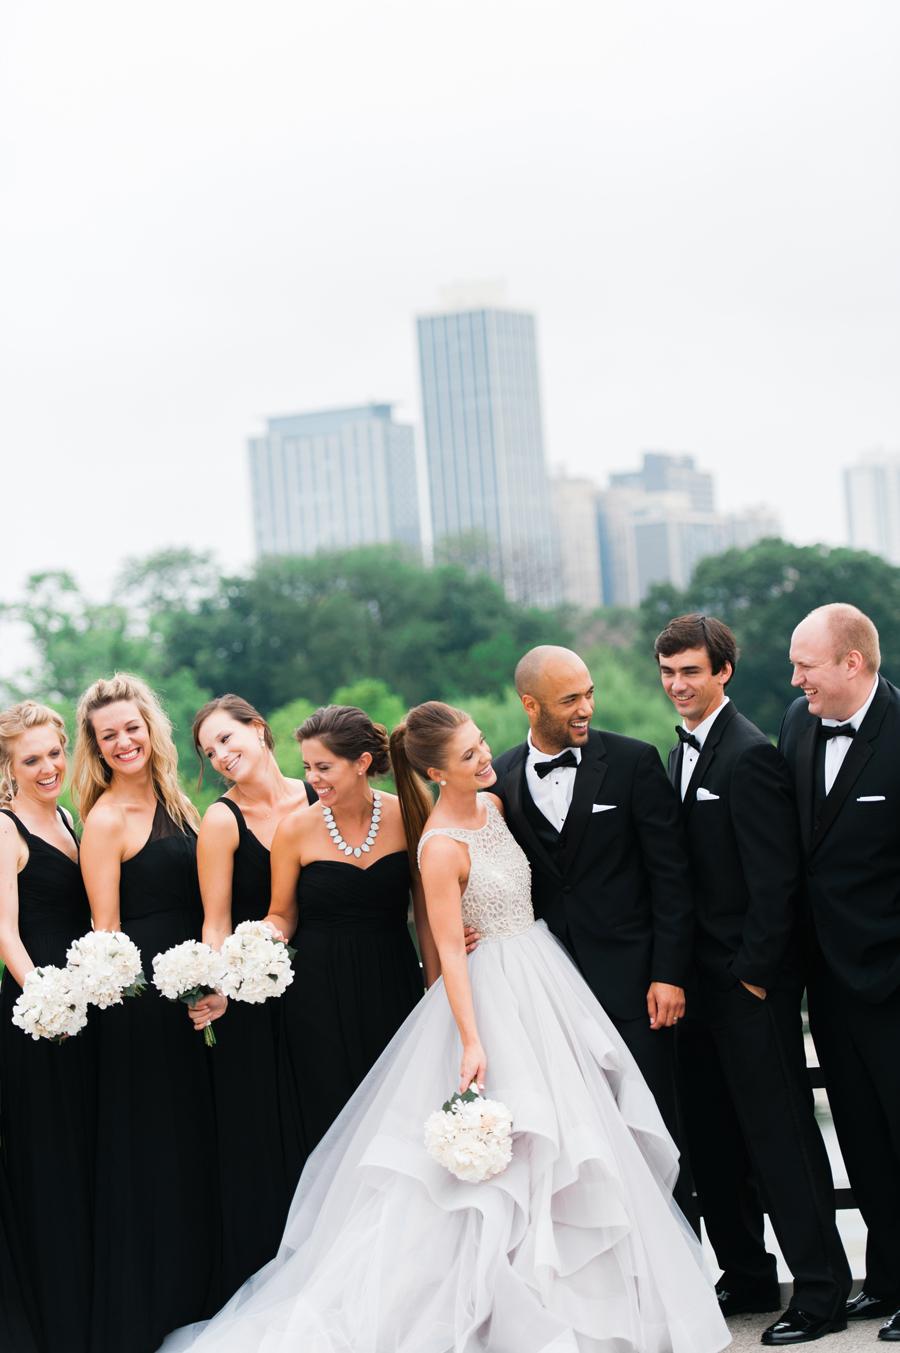 artistrie-co-best-wedding-photos-2015-019